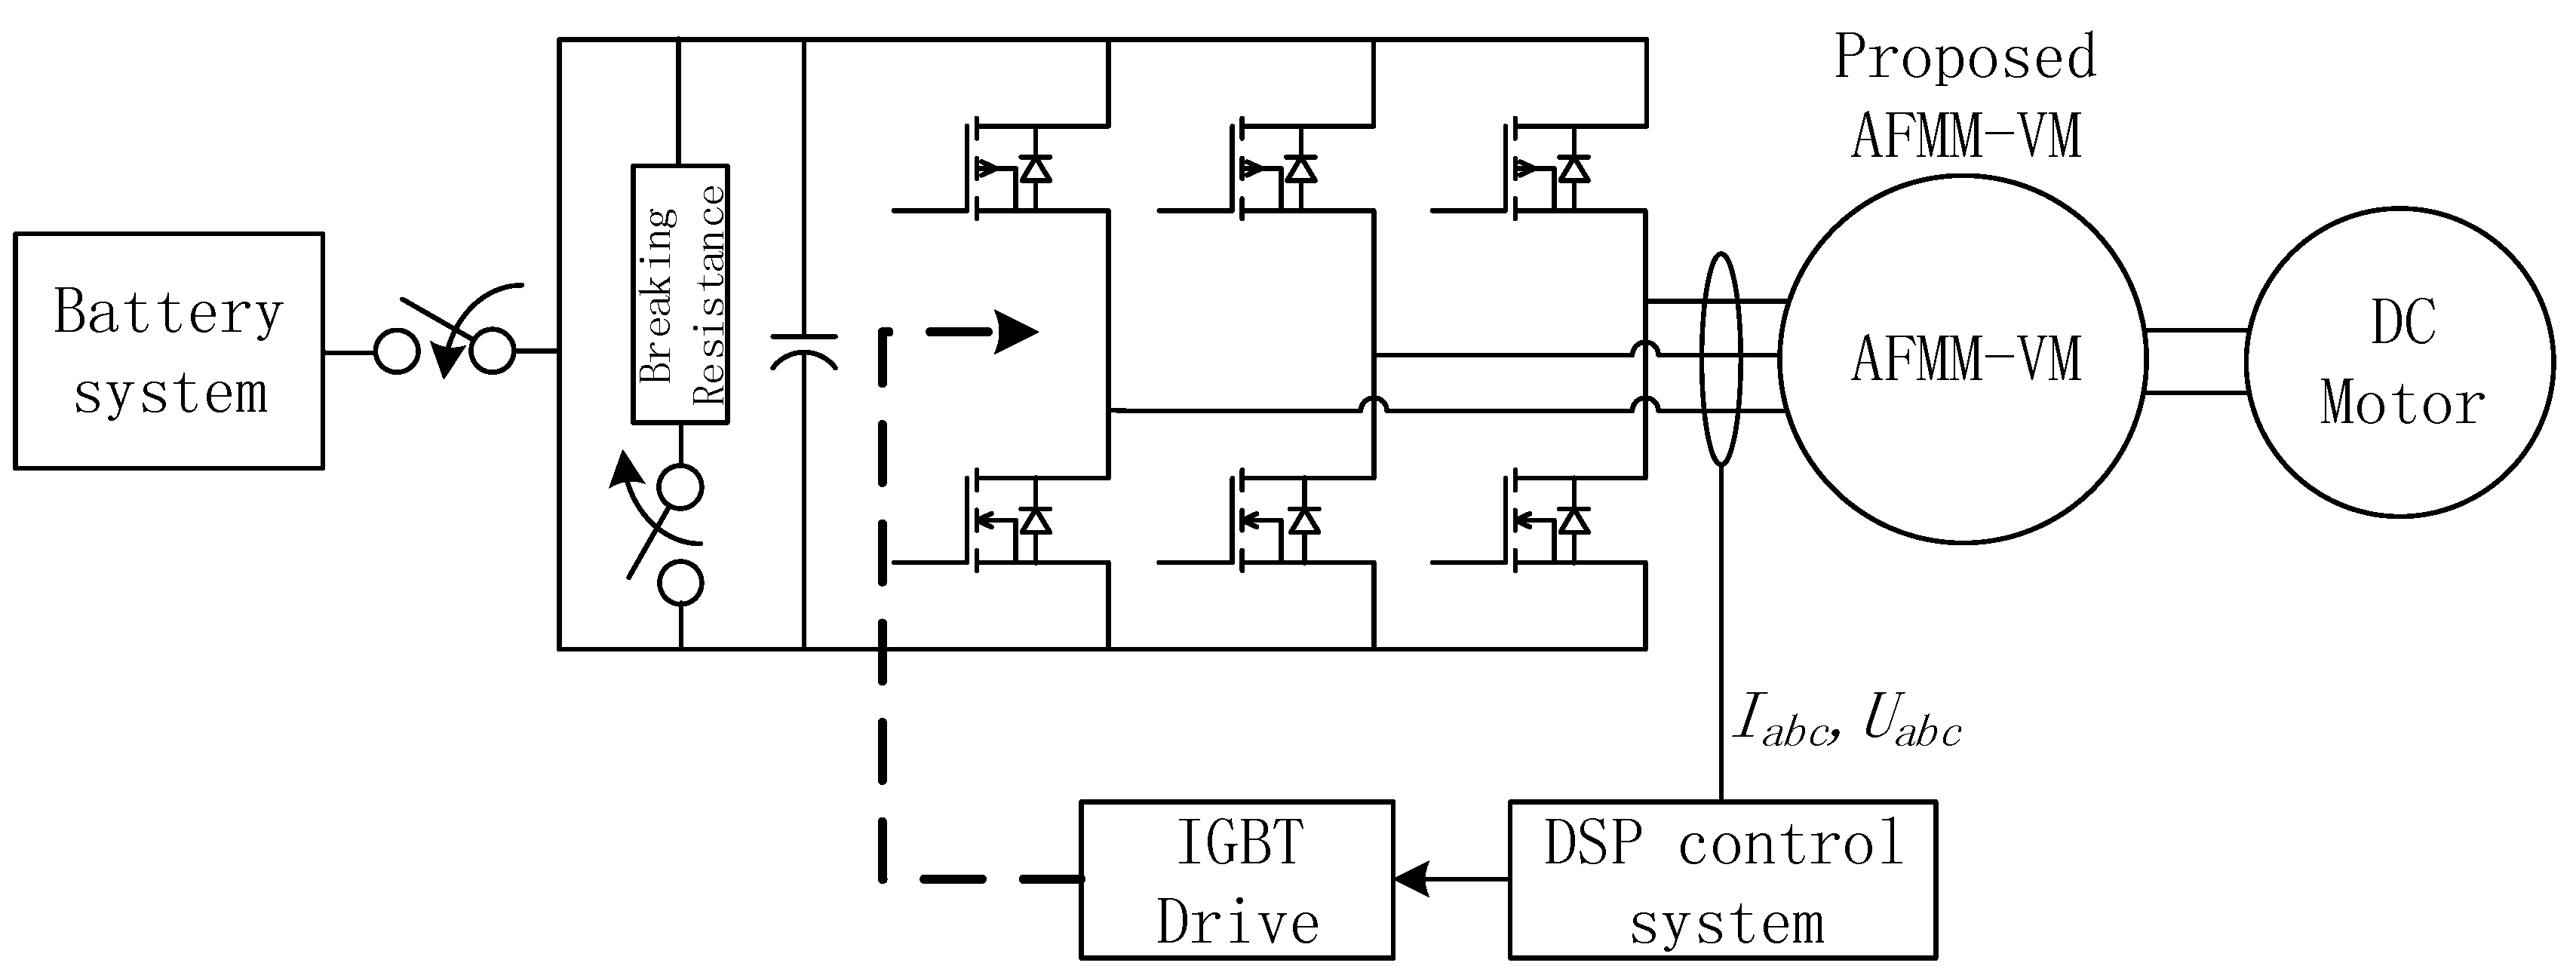 Dc Light Bulb Wiring Diagram - All Diagram Schematics on